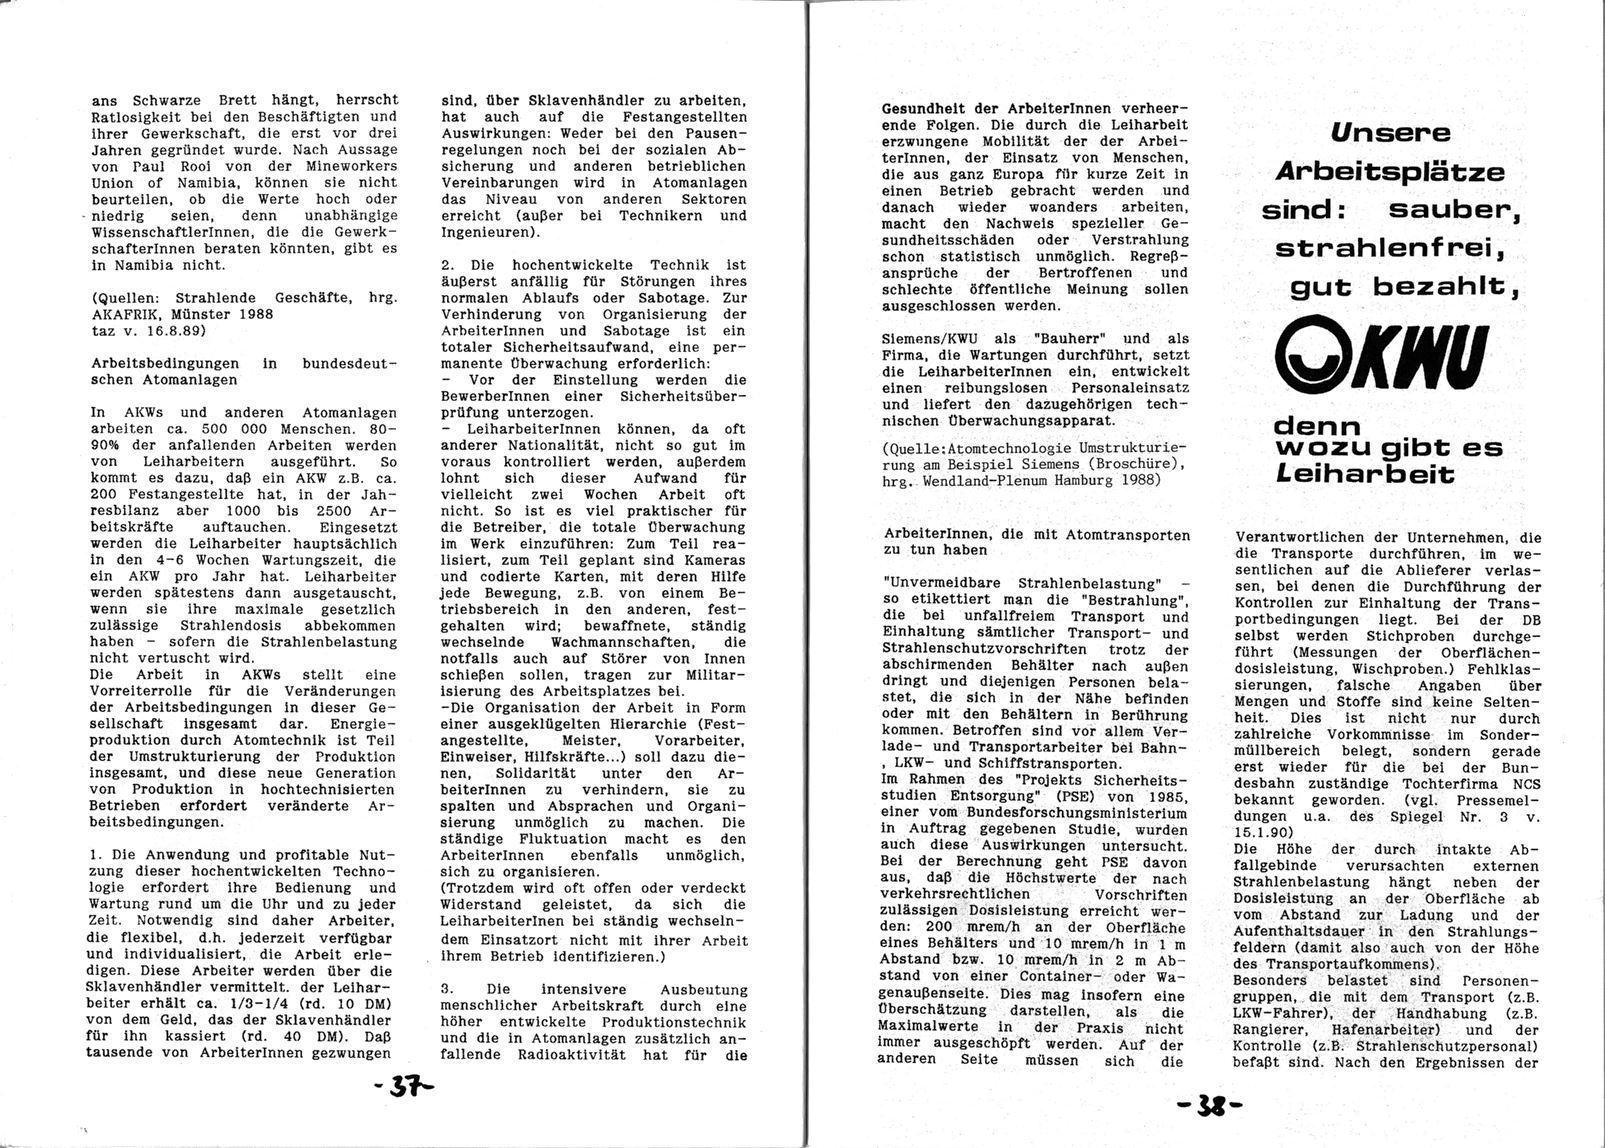 Hamburg_Atomtransporte_19900200_020